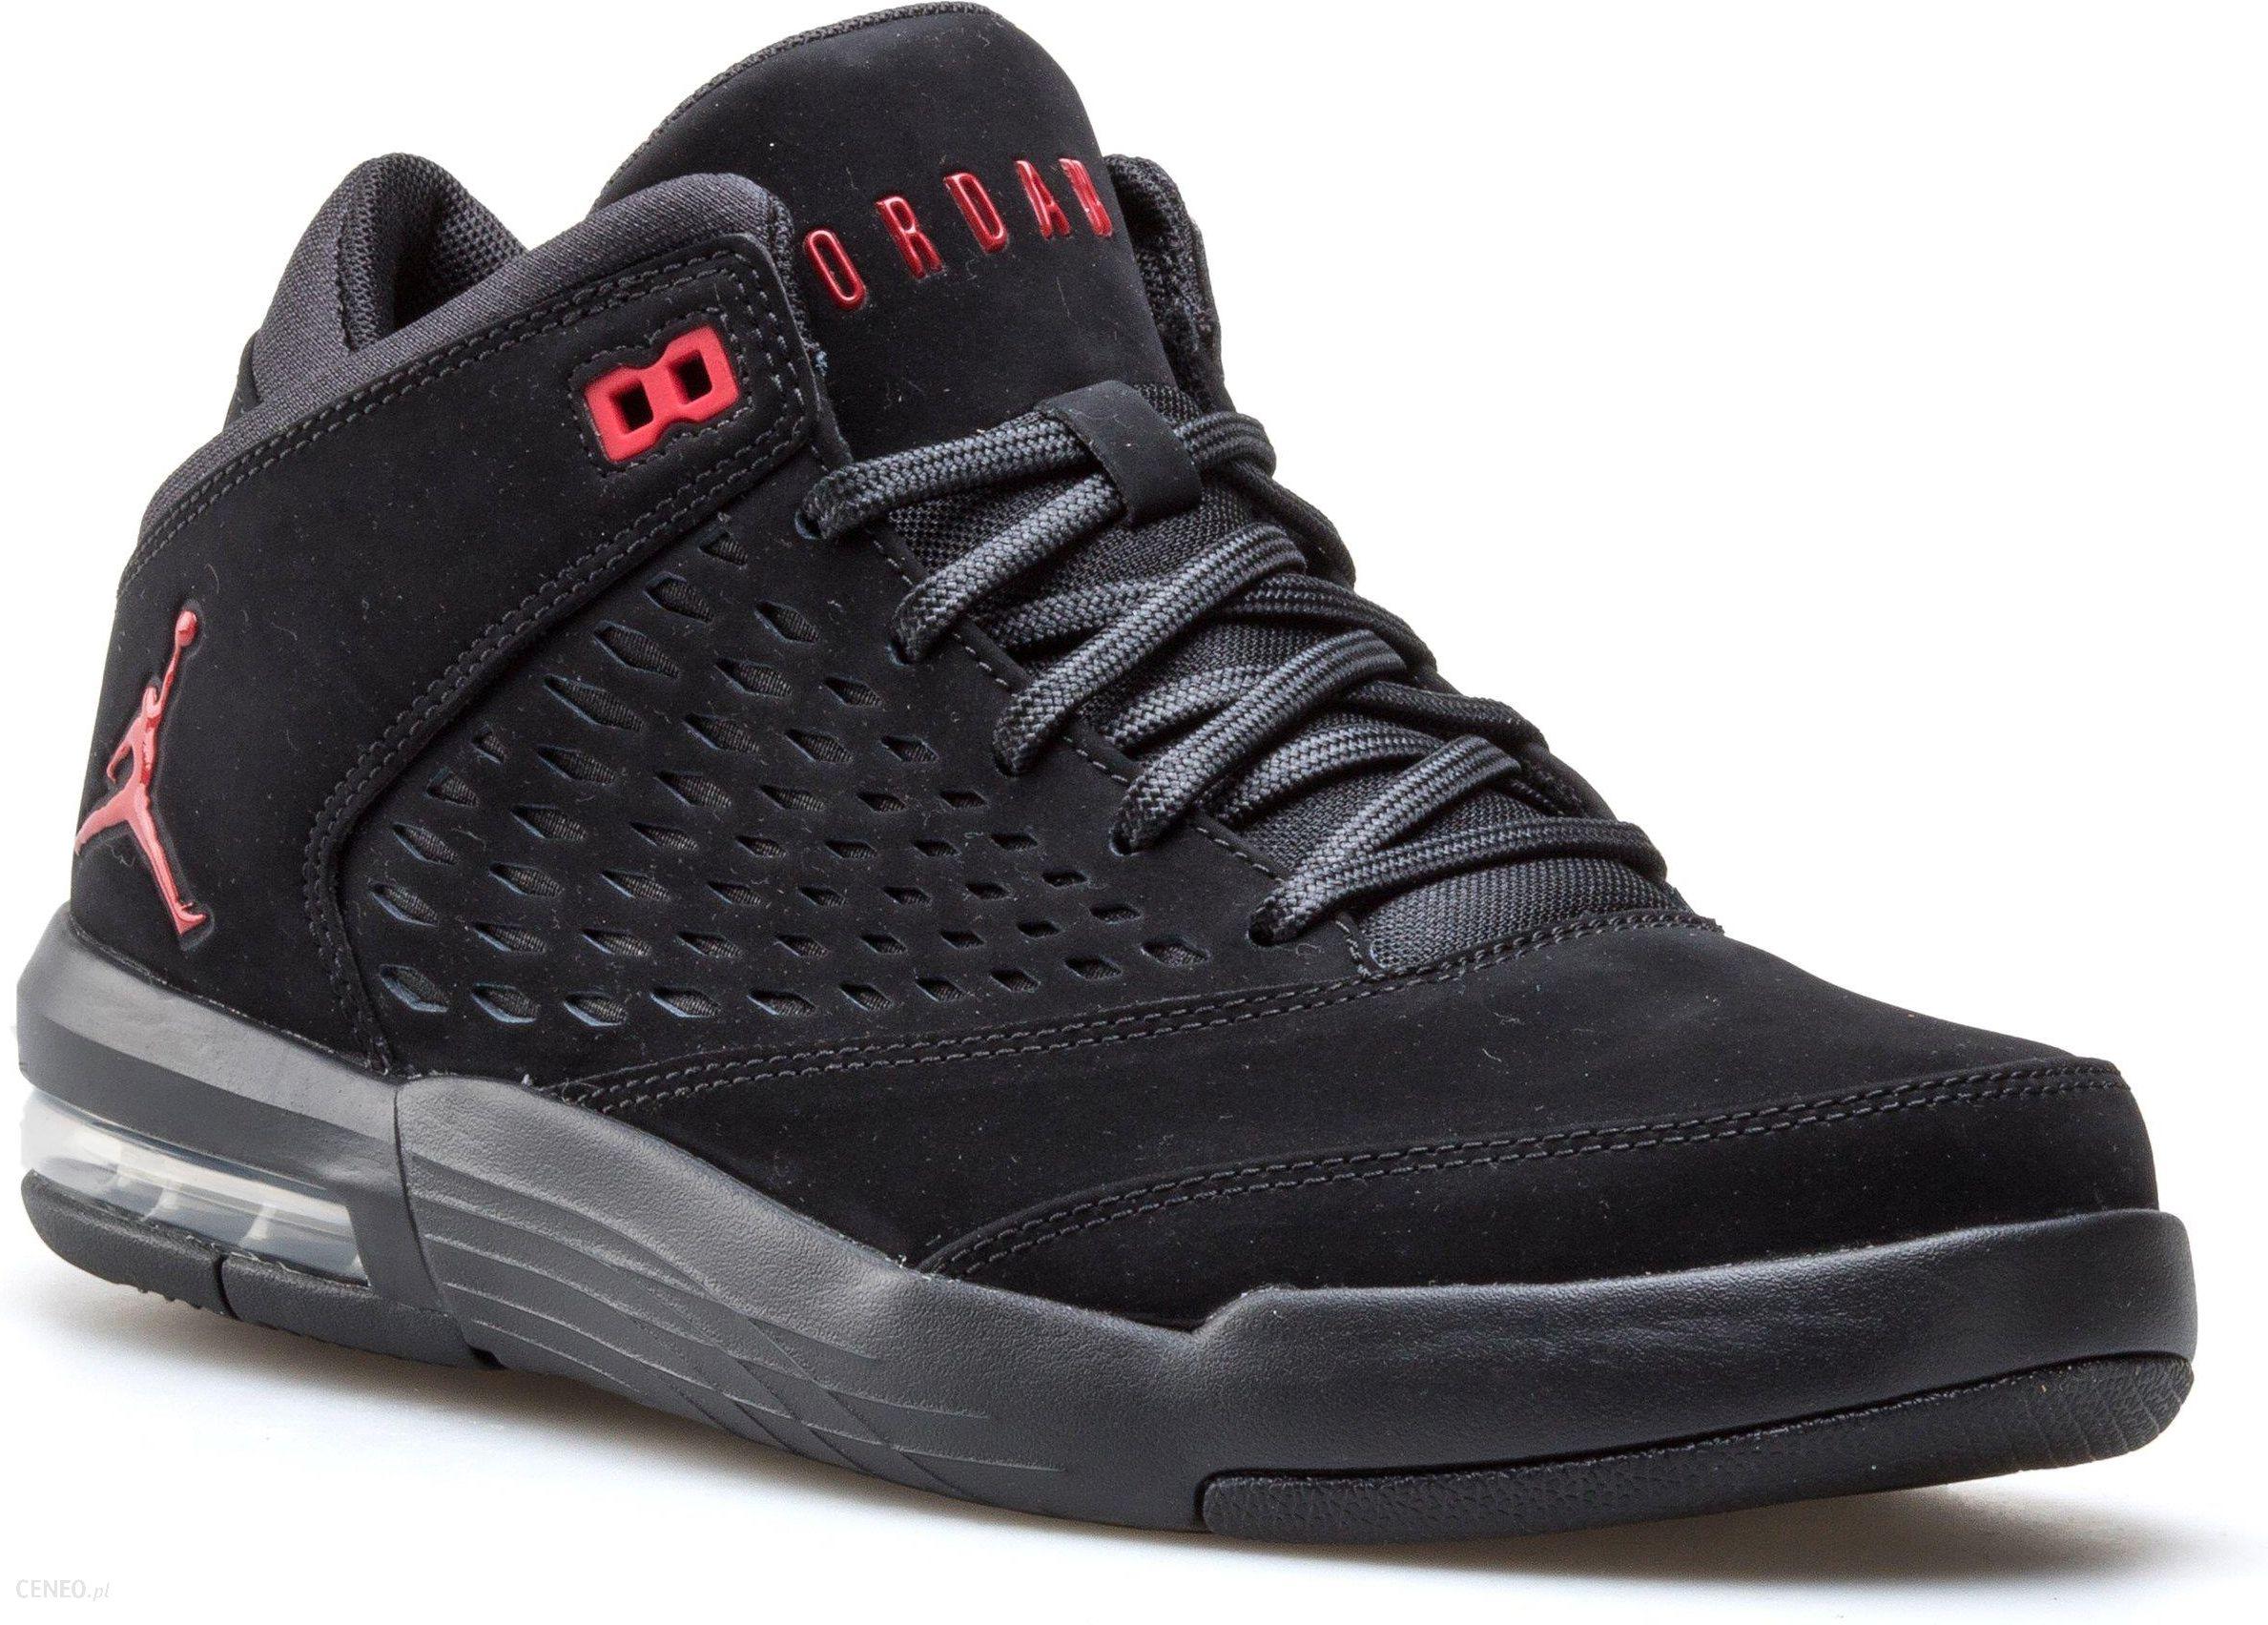 Buty Nike Jordan Flight Origin 921196 002 r. 41 Ceny i opinie Ceneo.pl